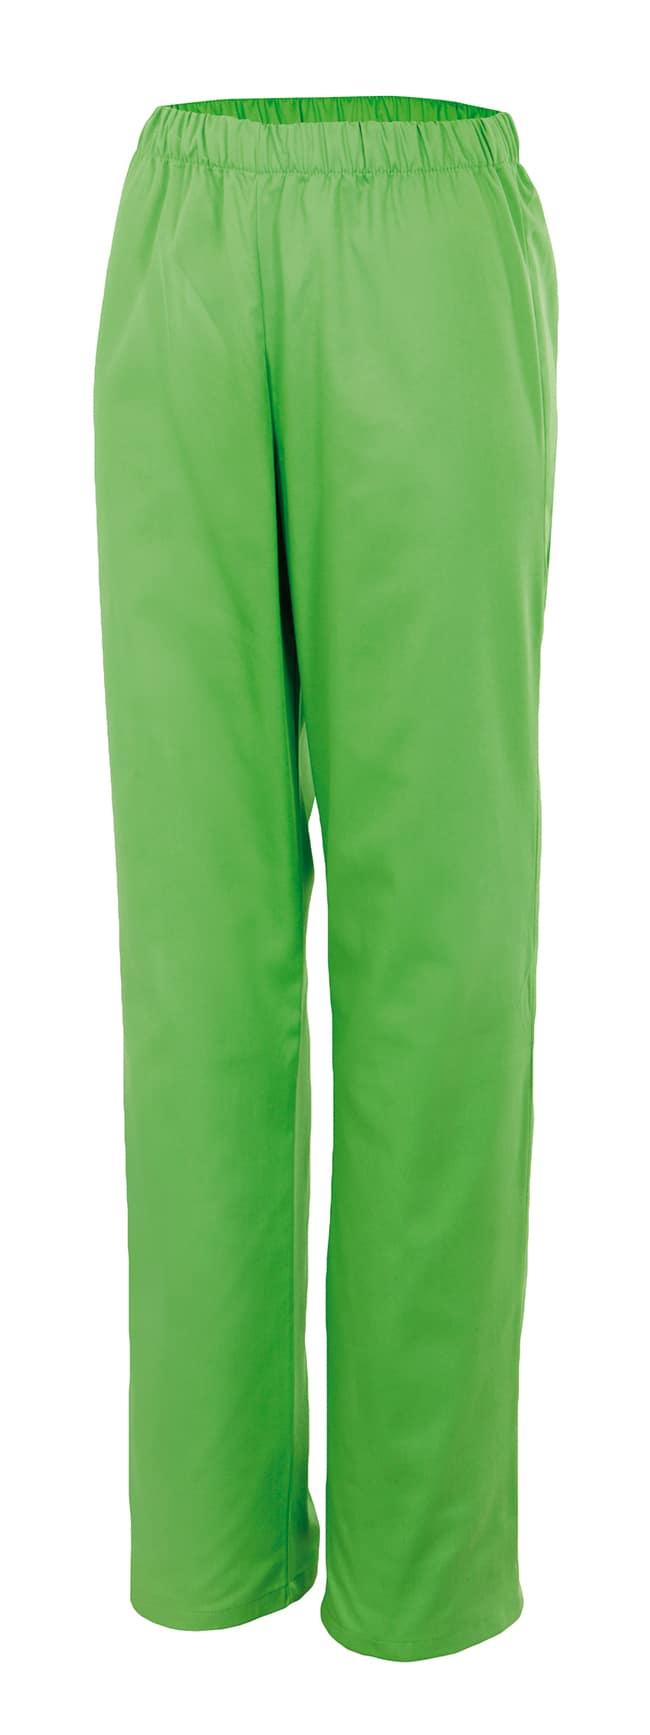 Velilla 333 PantalÓn Pijama Verde Lima